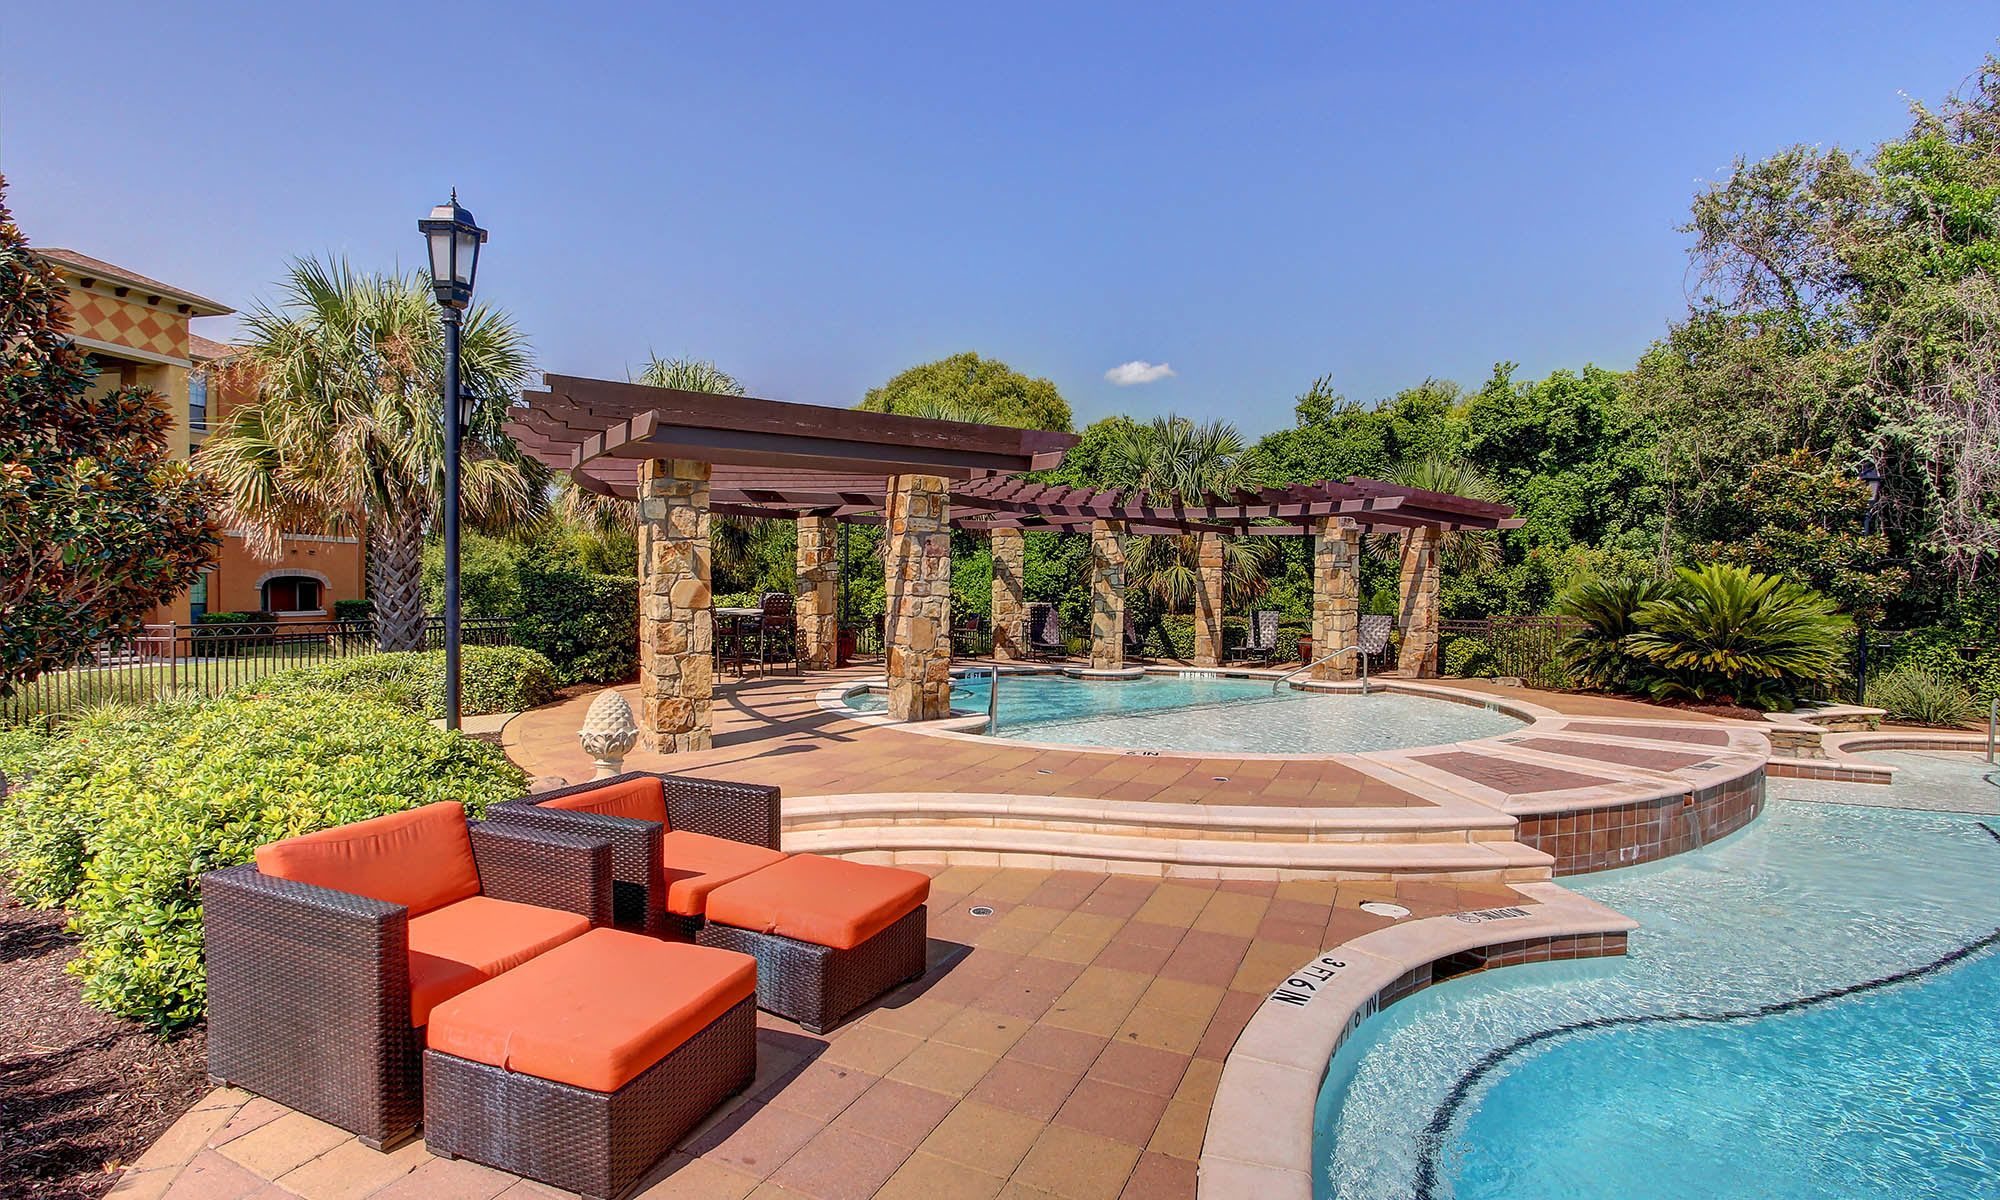 Austin Tx Apartments For Rent The Bridge At Center Ridge